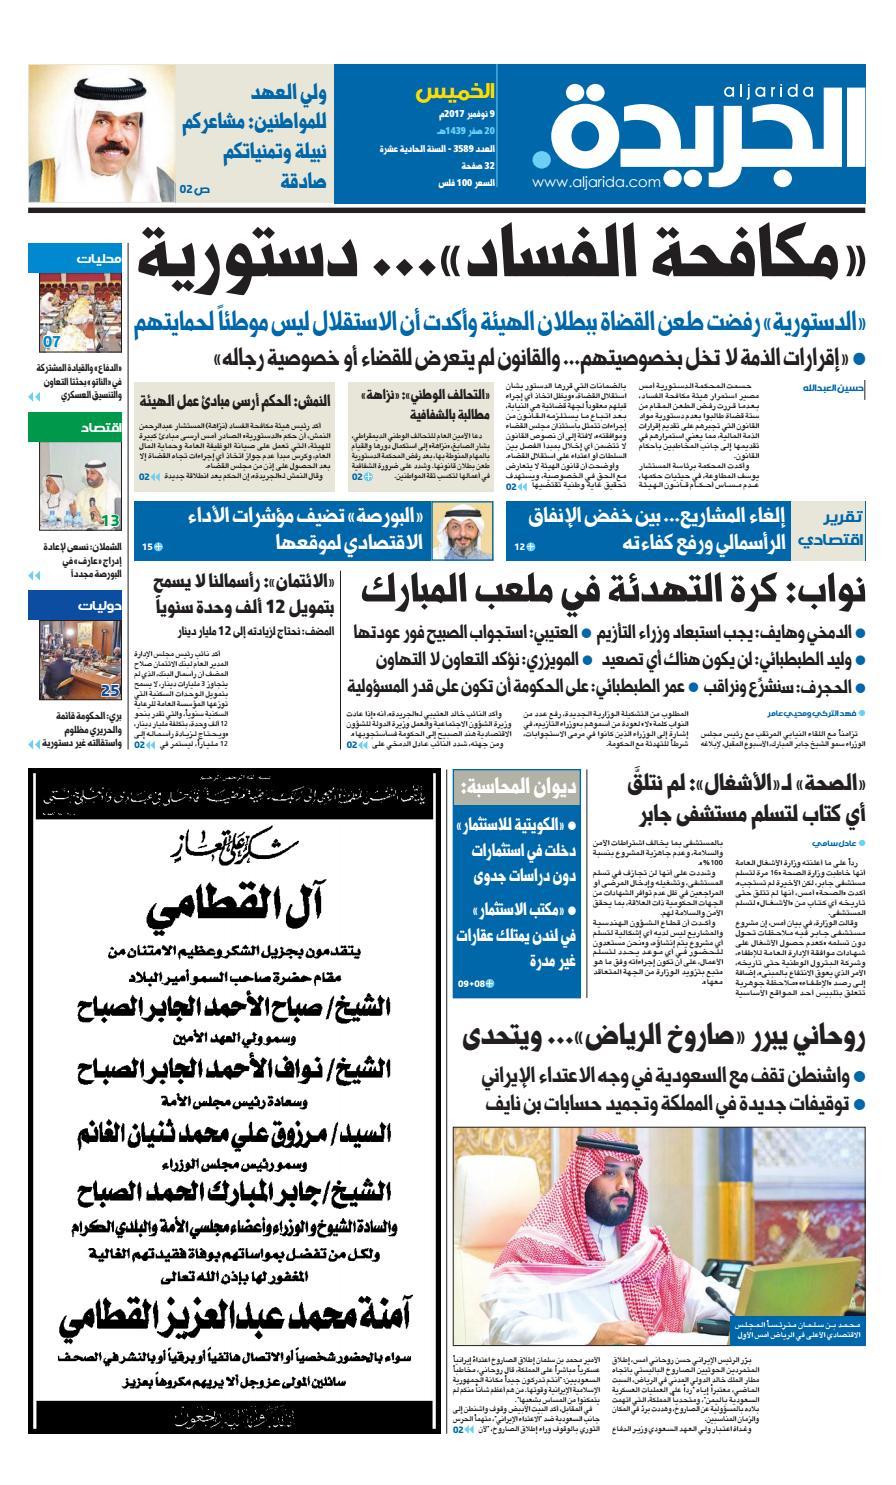 bd25b8050 عدد الجريدة الخميس 09 نوفمبر 2017 by Aljarida Newspaper - issuu